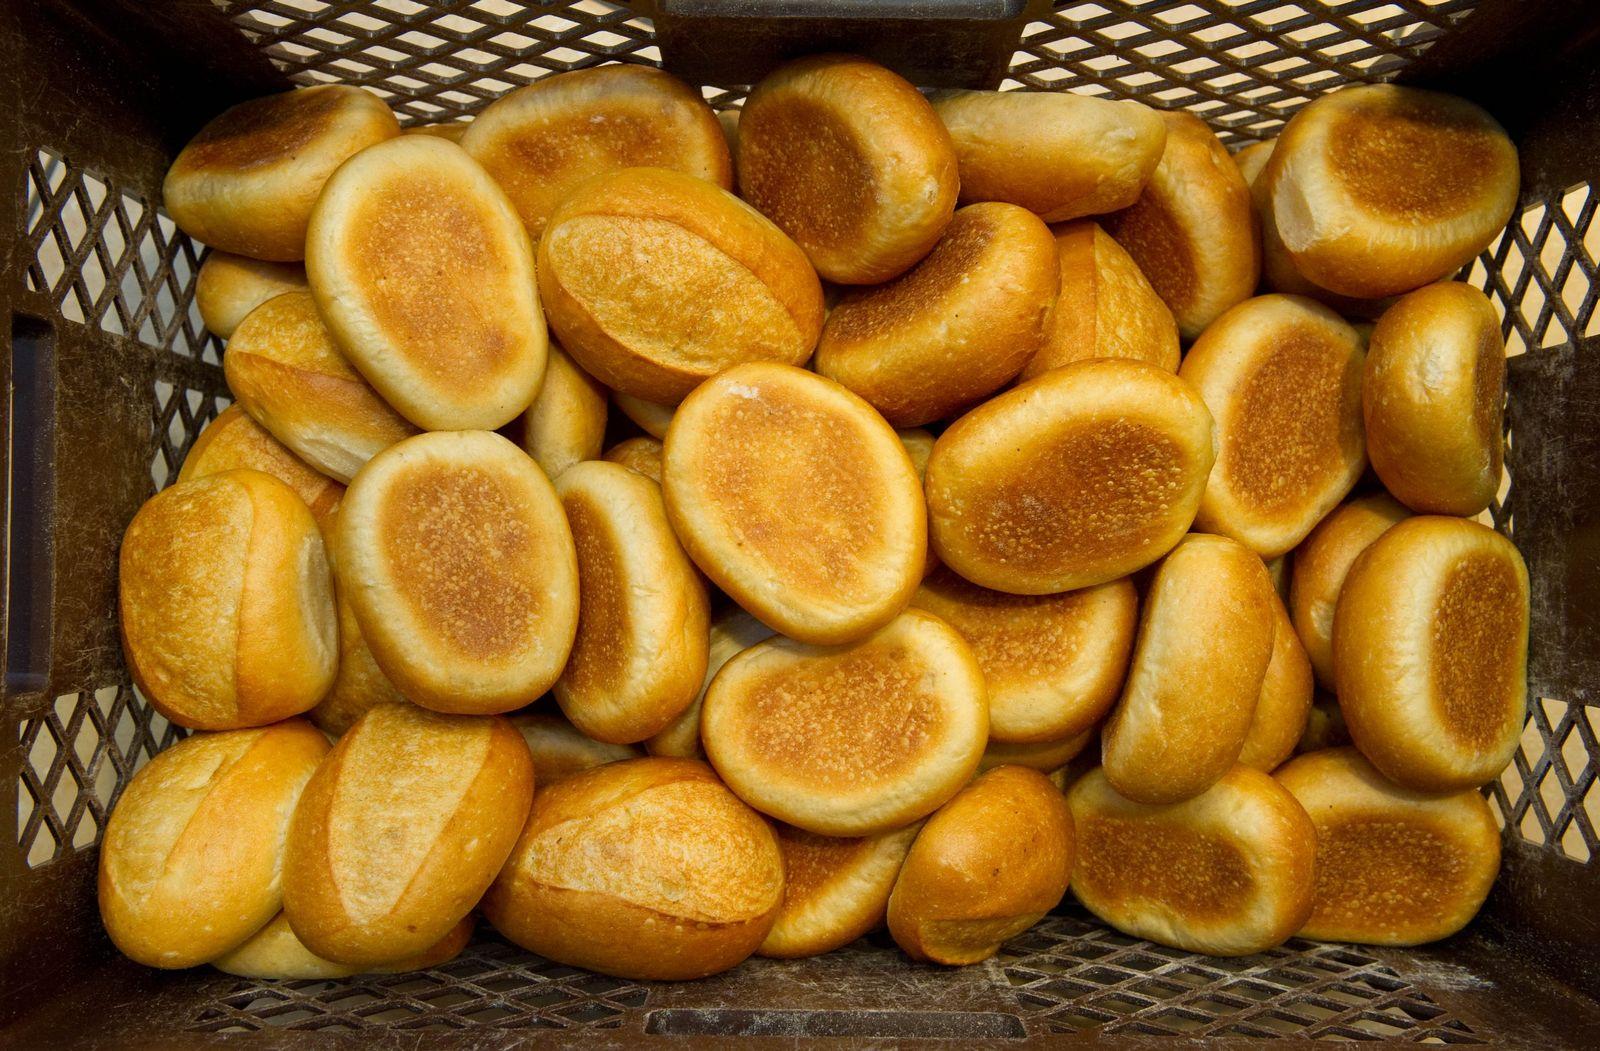 Brotpreise steigen